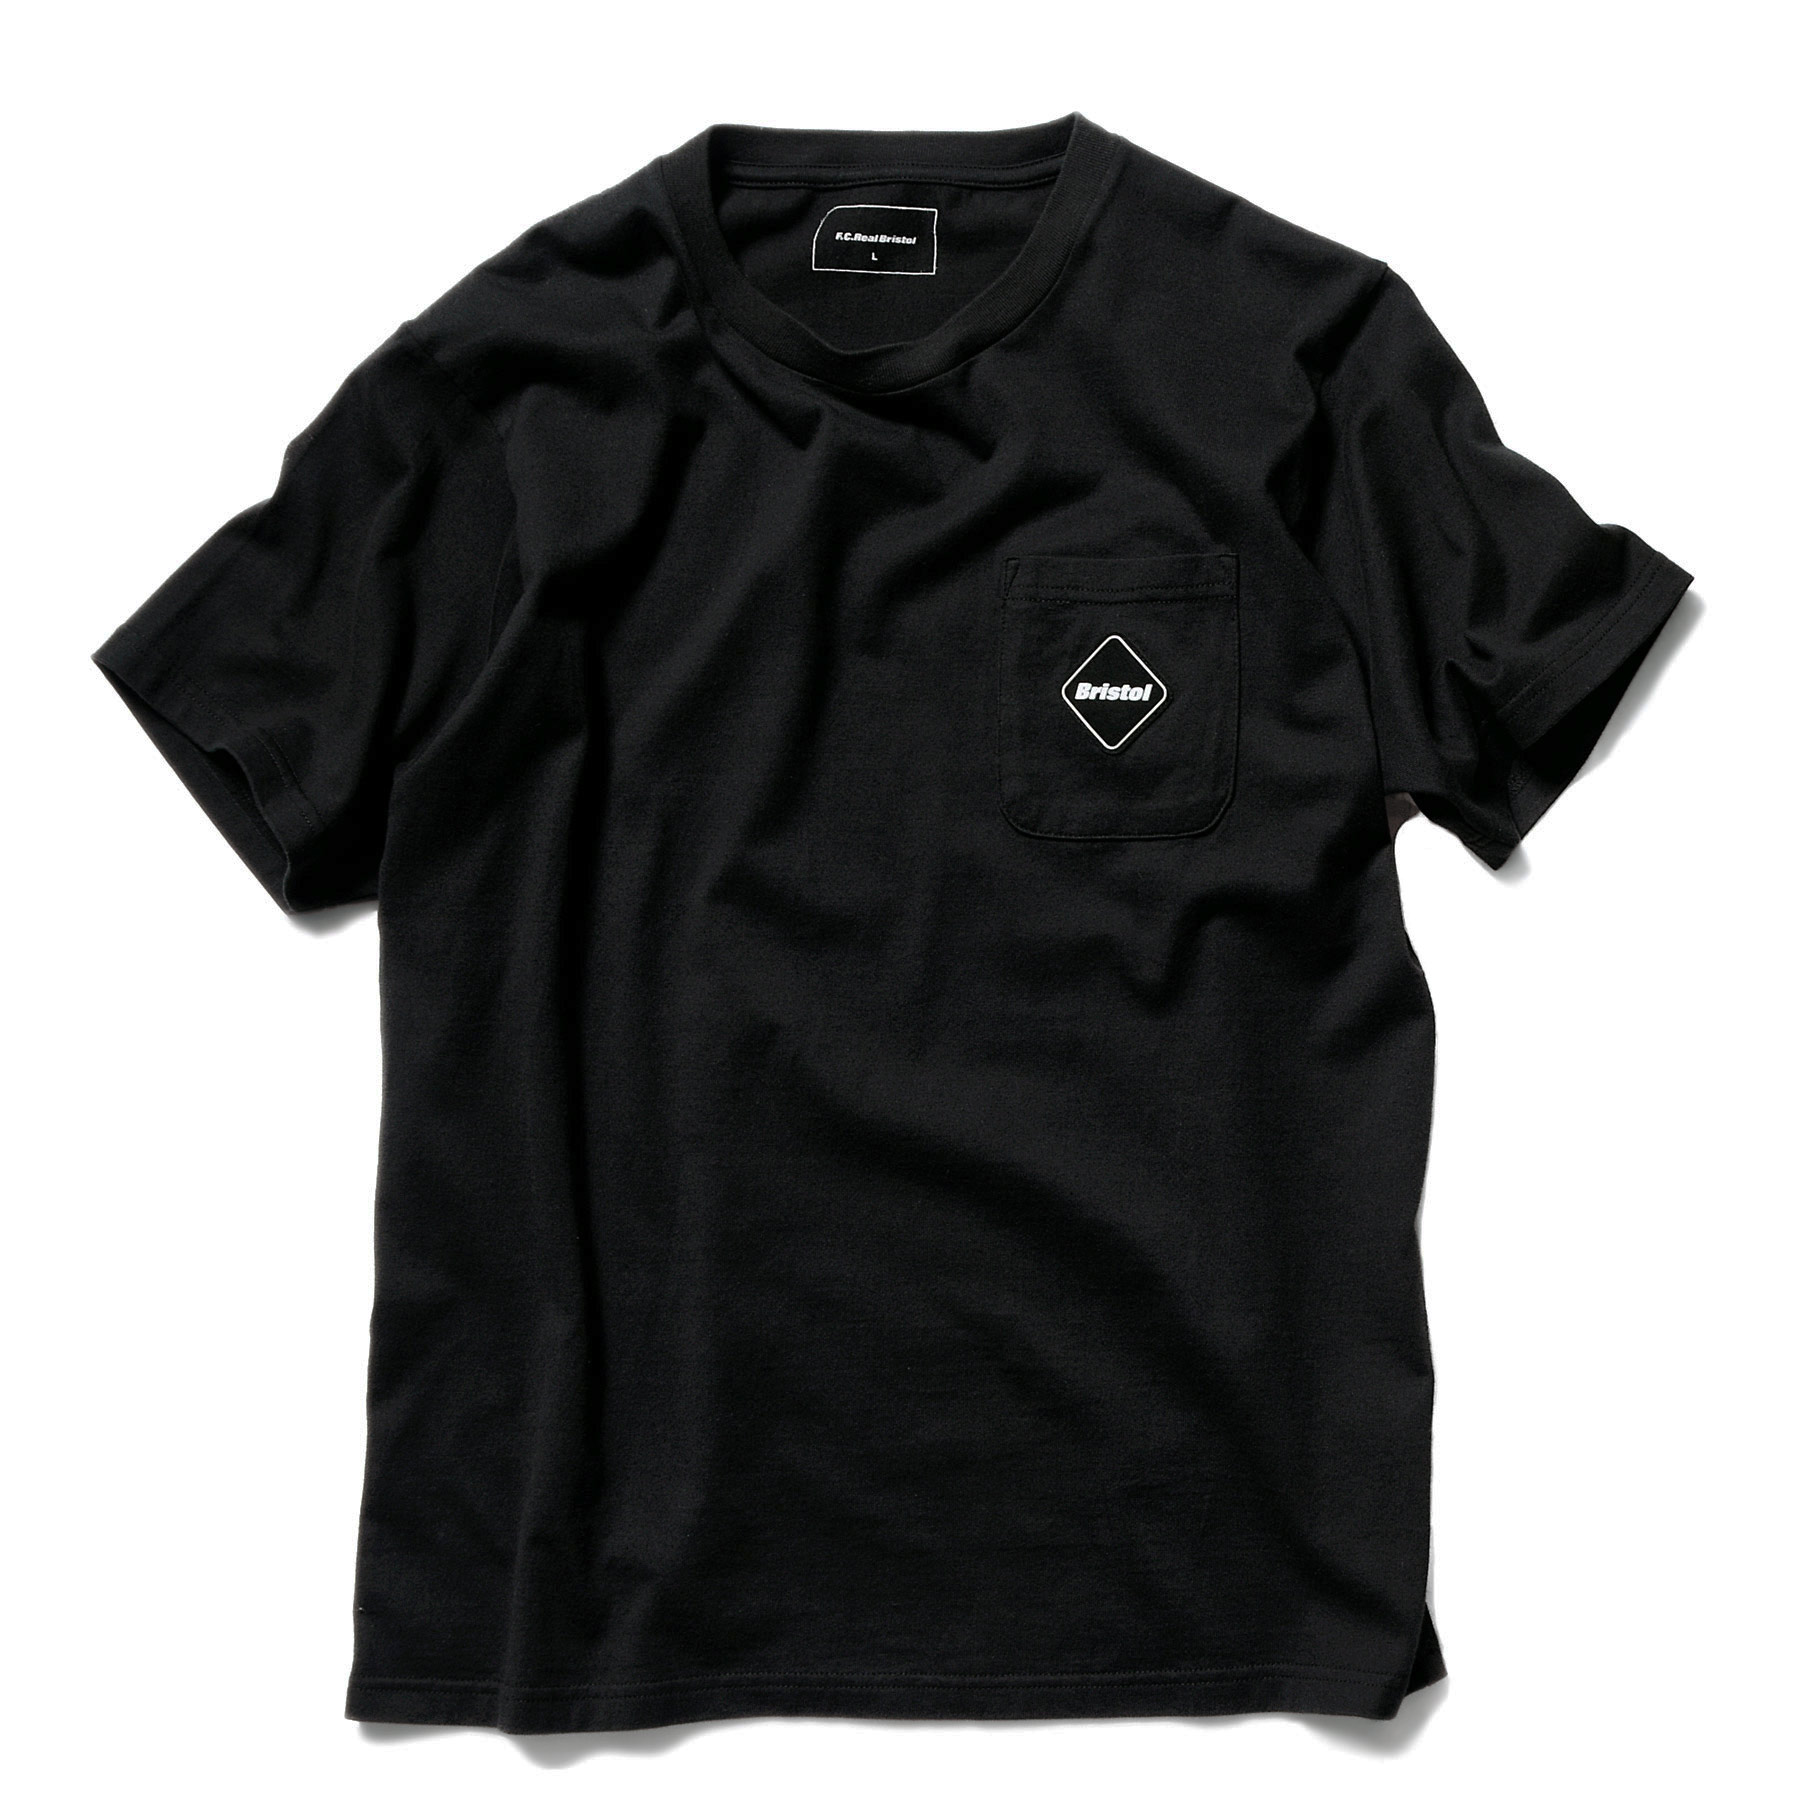 F.C.Real Bristol / CAMOUFLAGE BIG LOGO POCKET TEE -black